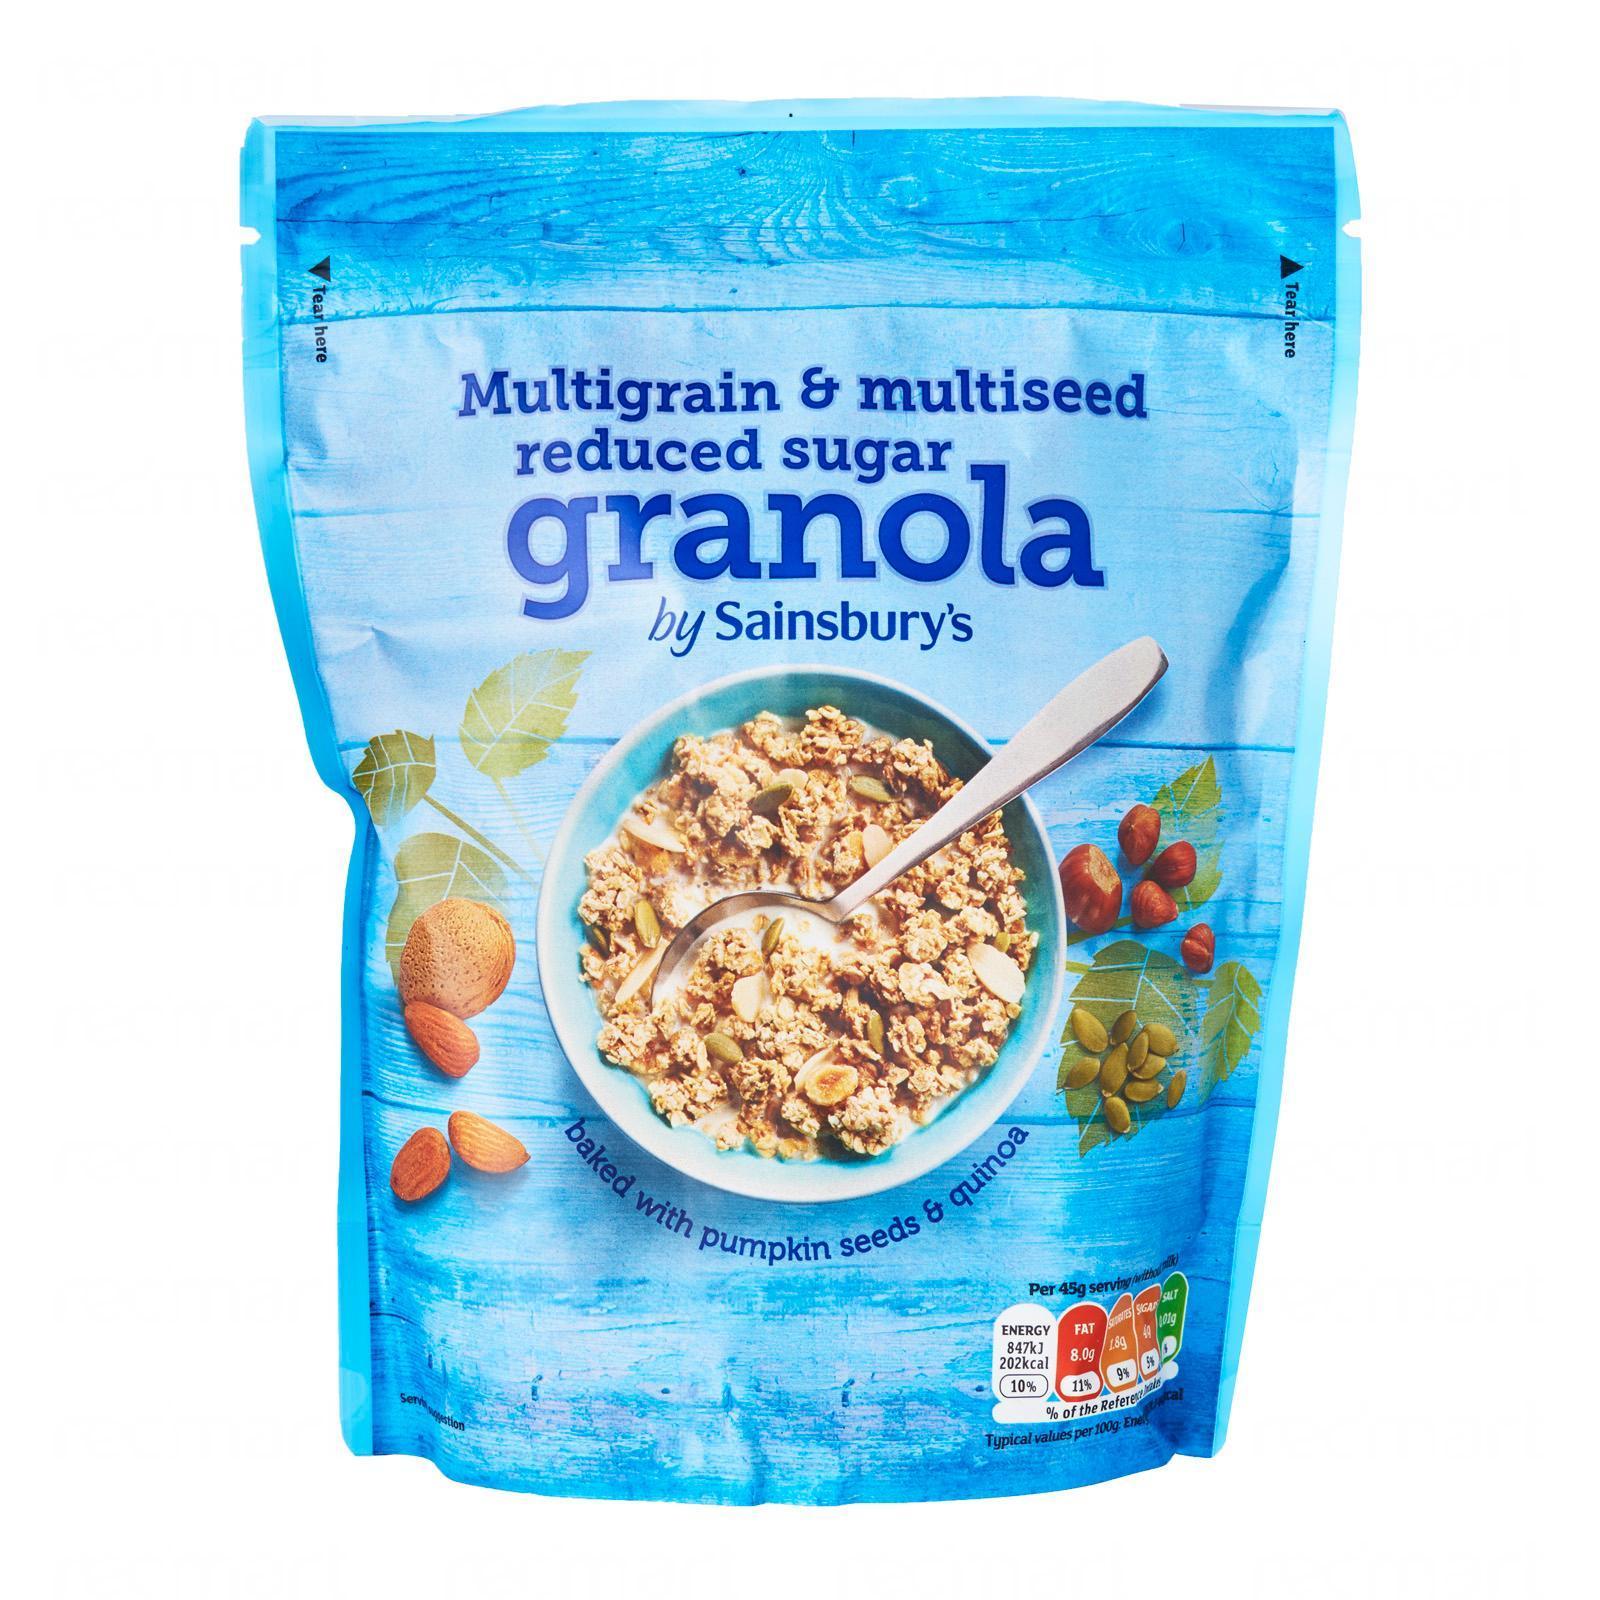 Sainsbury's Granola Reduced Sugar